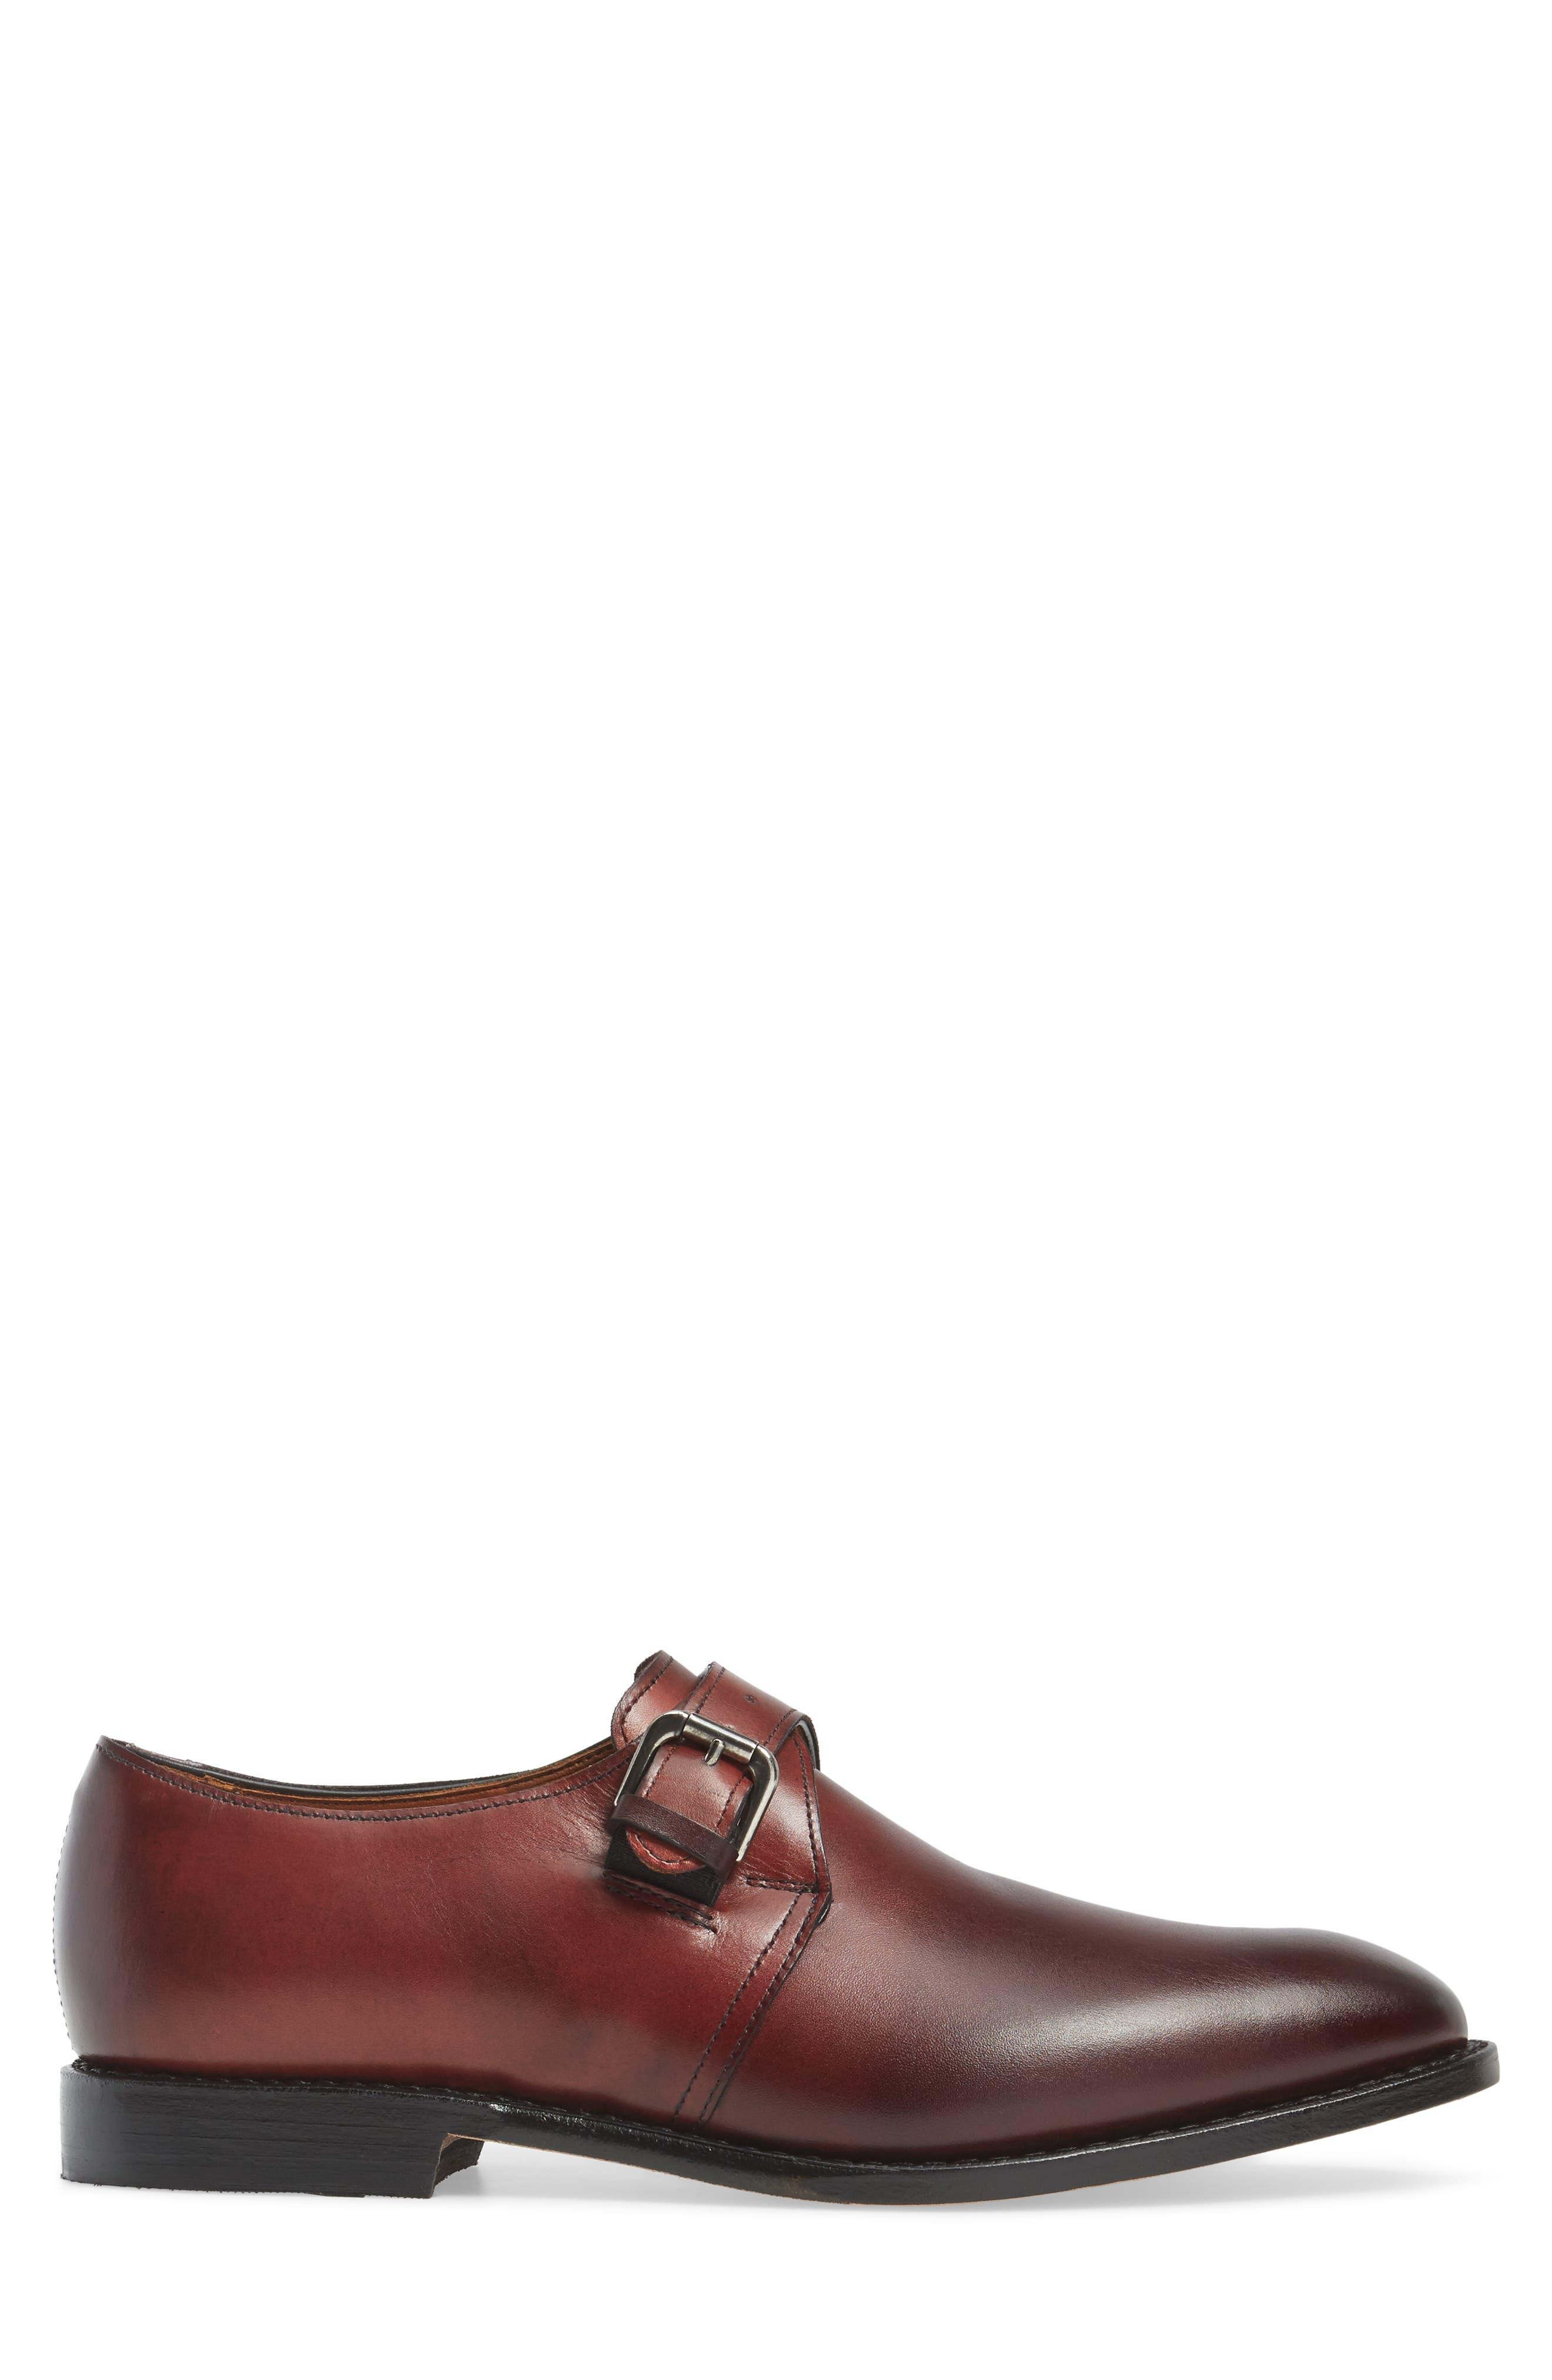 Warwick Monk Strap Shoe,                             Alternate thumbnail 3, color,                             Oxblood Leather